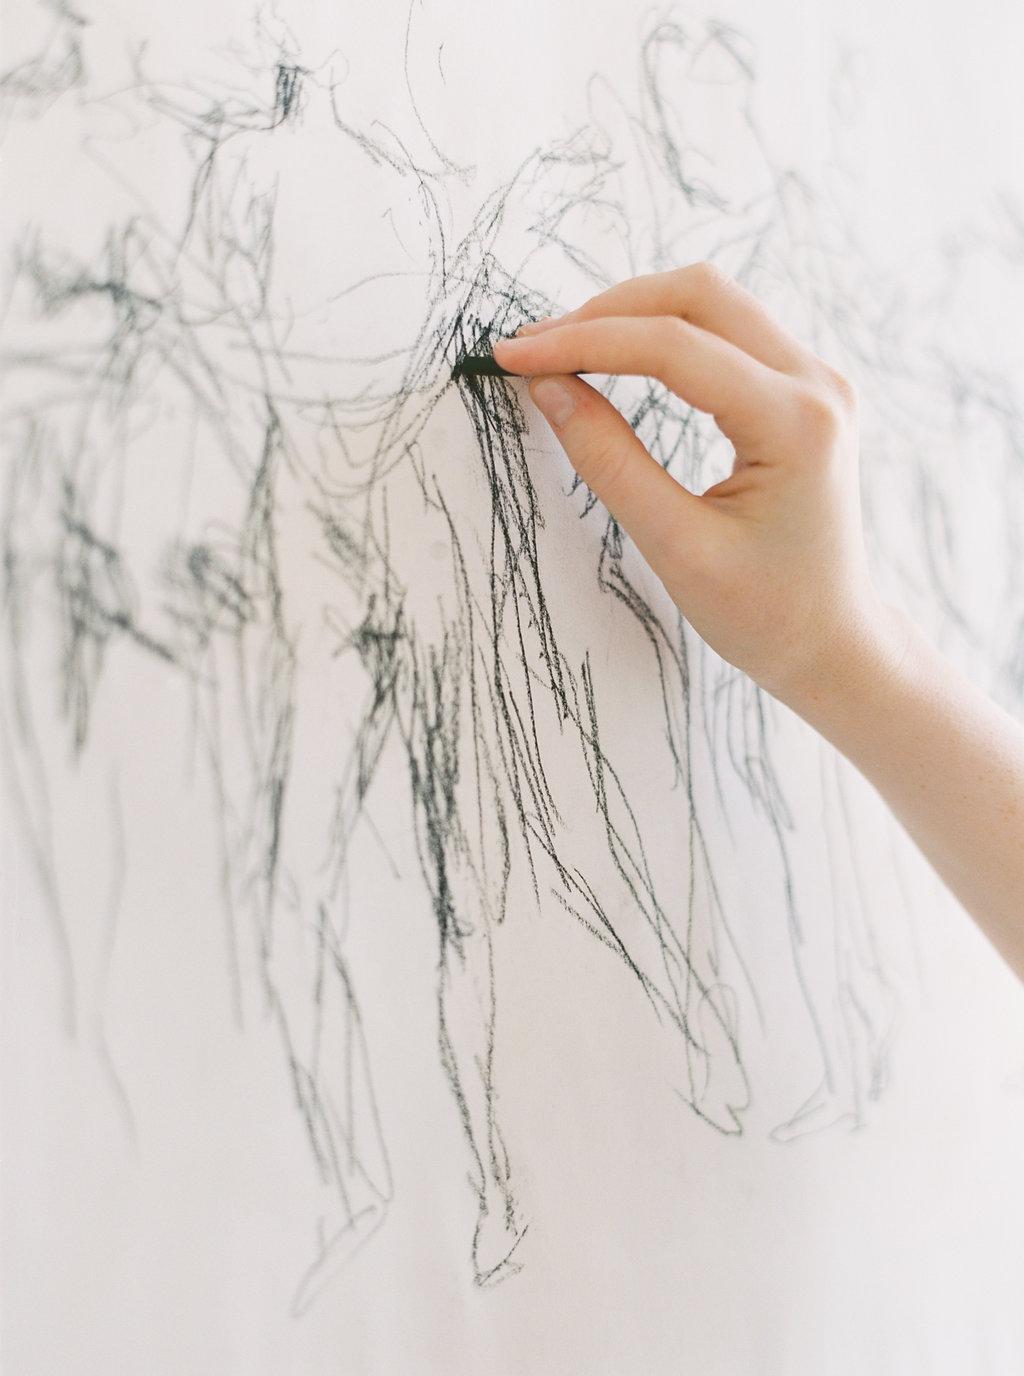 sandra-chau-stylist-fine-art-branding-shoot-mishku-studio-sketch-drawing-unearthingtc.jpg